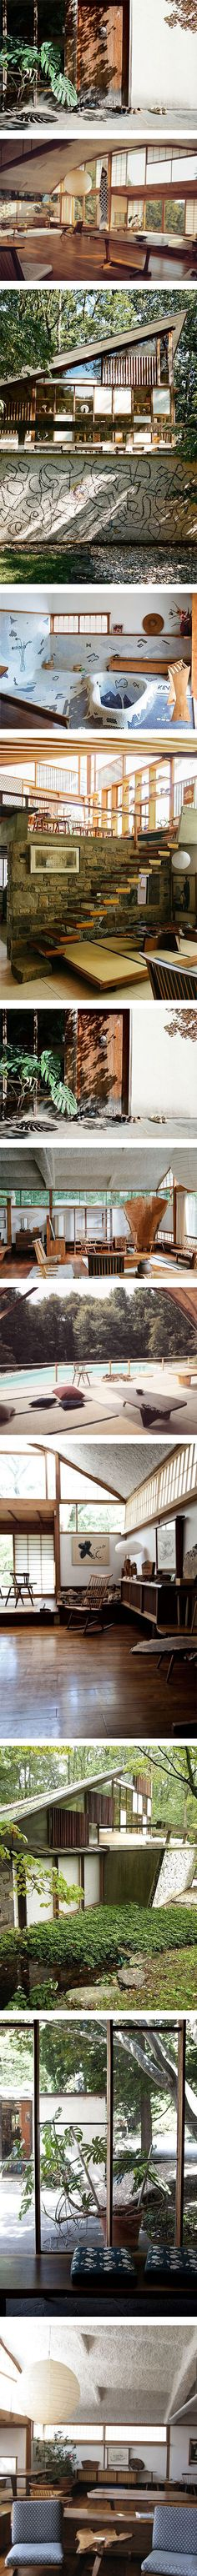 George Nakashima's Pennsylvanian estate featuring Furniture on Nuji.com #georgenakashima #architecture #pennsylvania